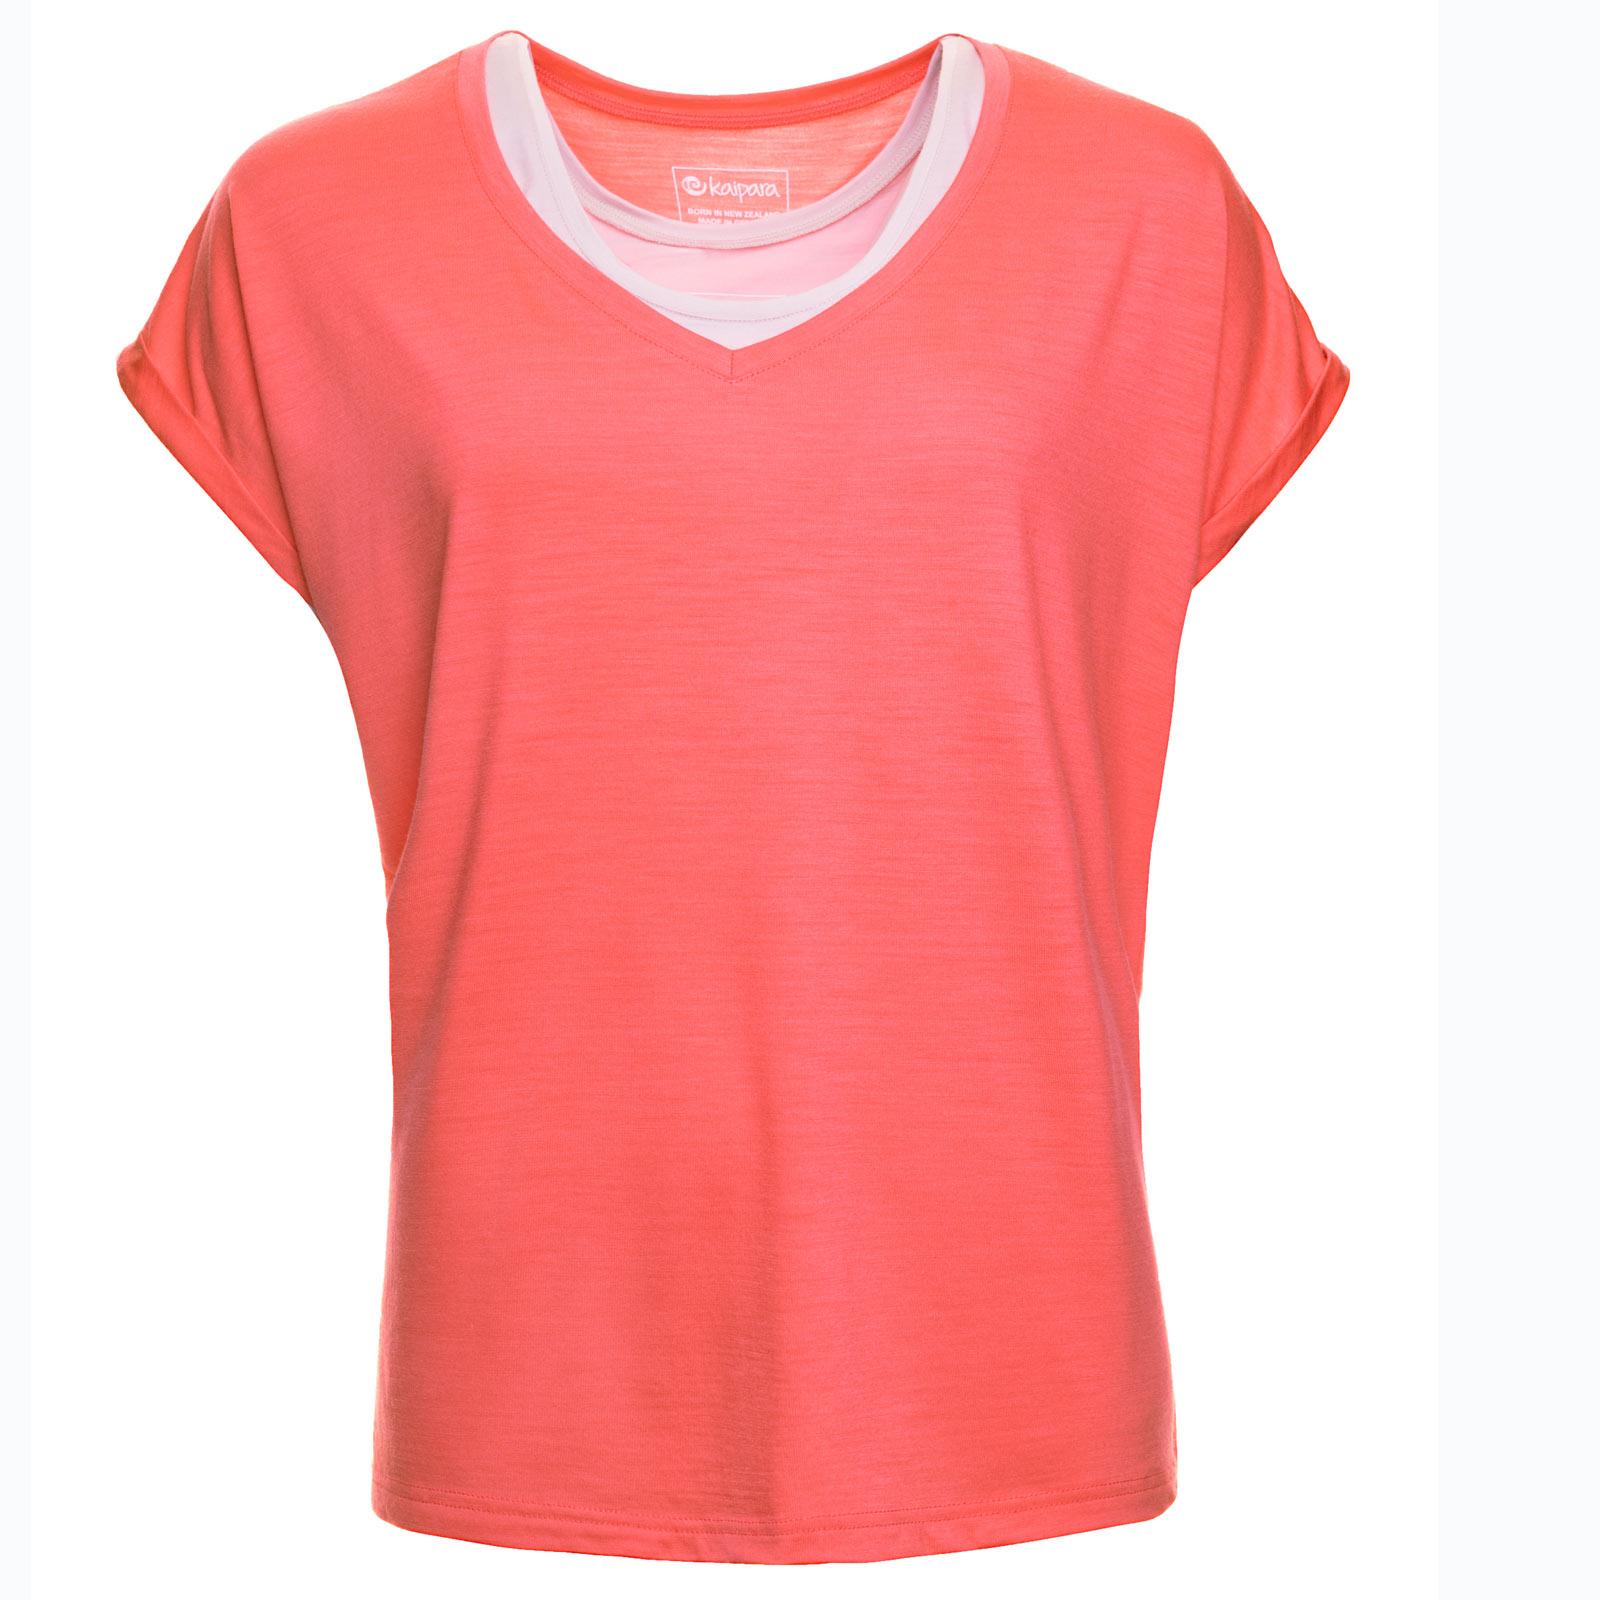 URBAN LIMITED Merino Shirt Damen Kurzarm Oversized V-Neck 200 Coral XS